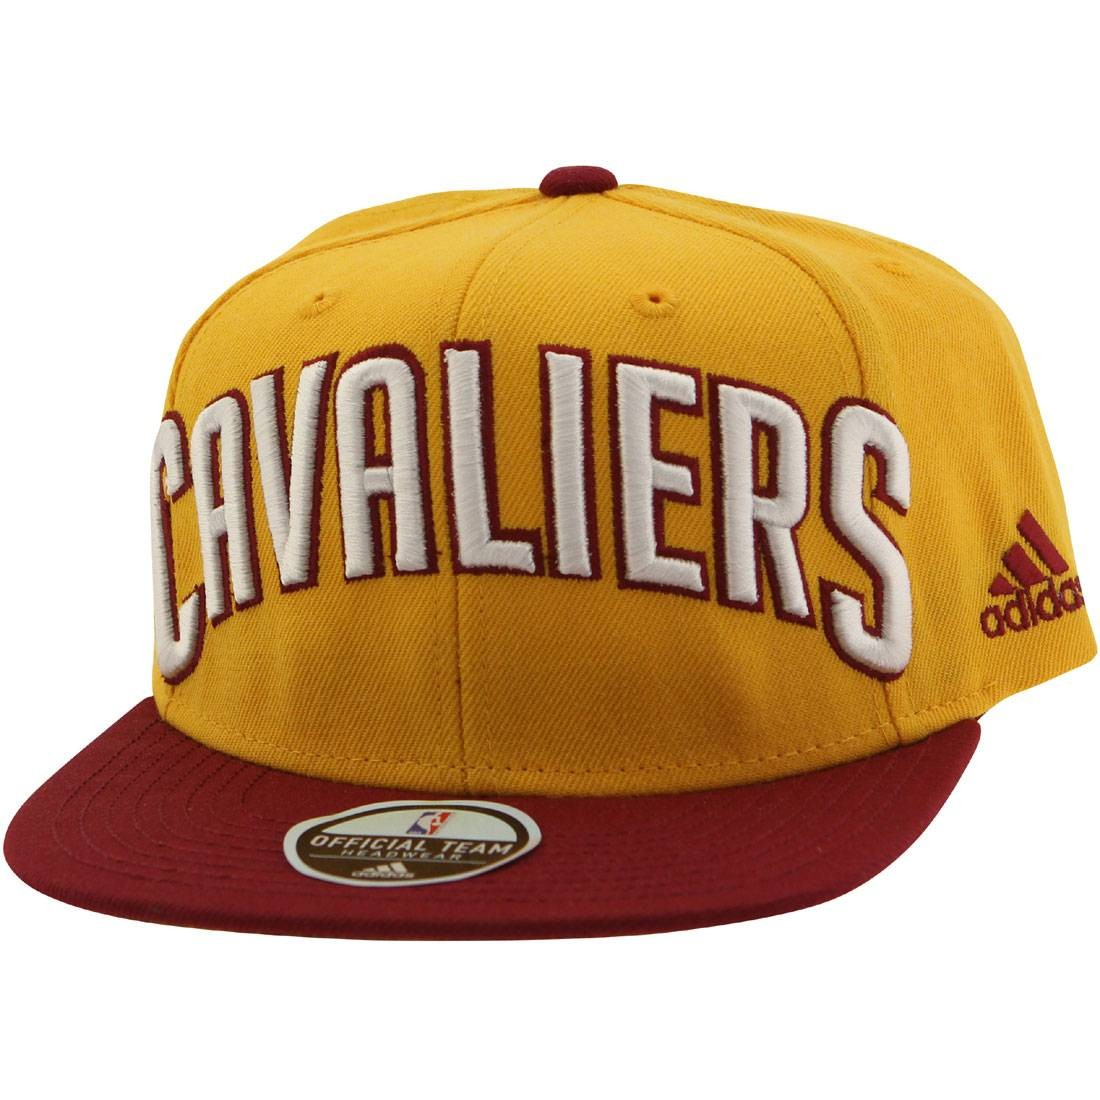 Adidas NBA Cleveland Cavaliers On Court Snapback Cap (gold / maroon)